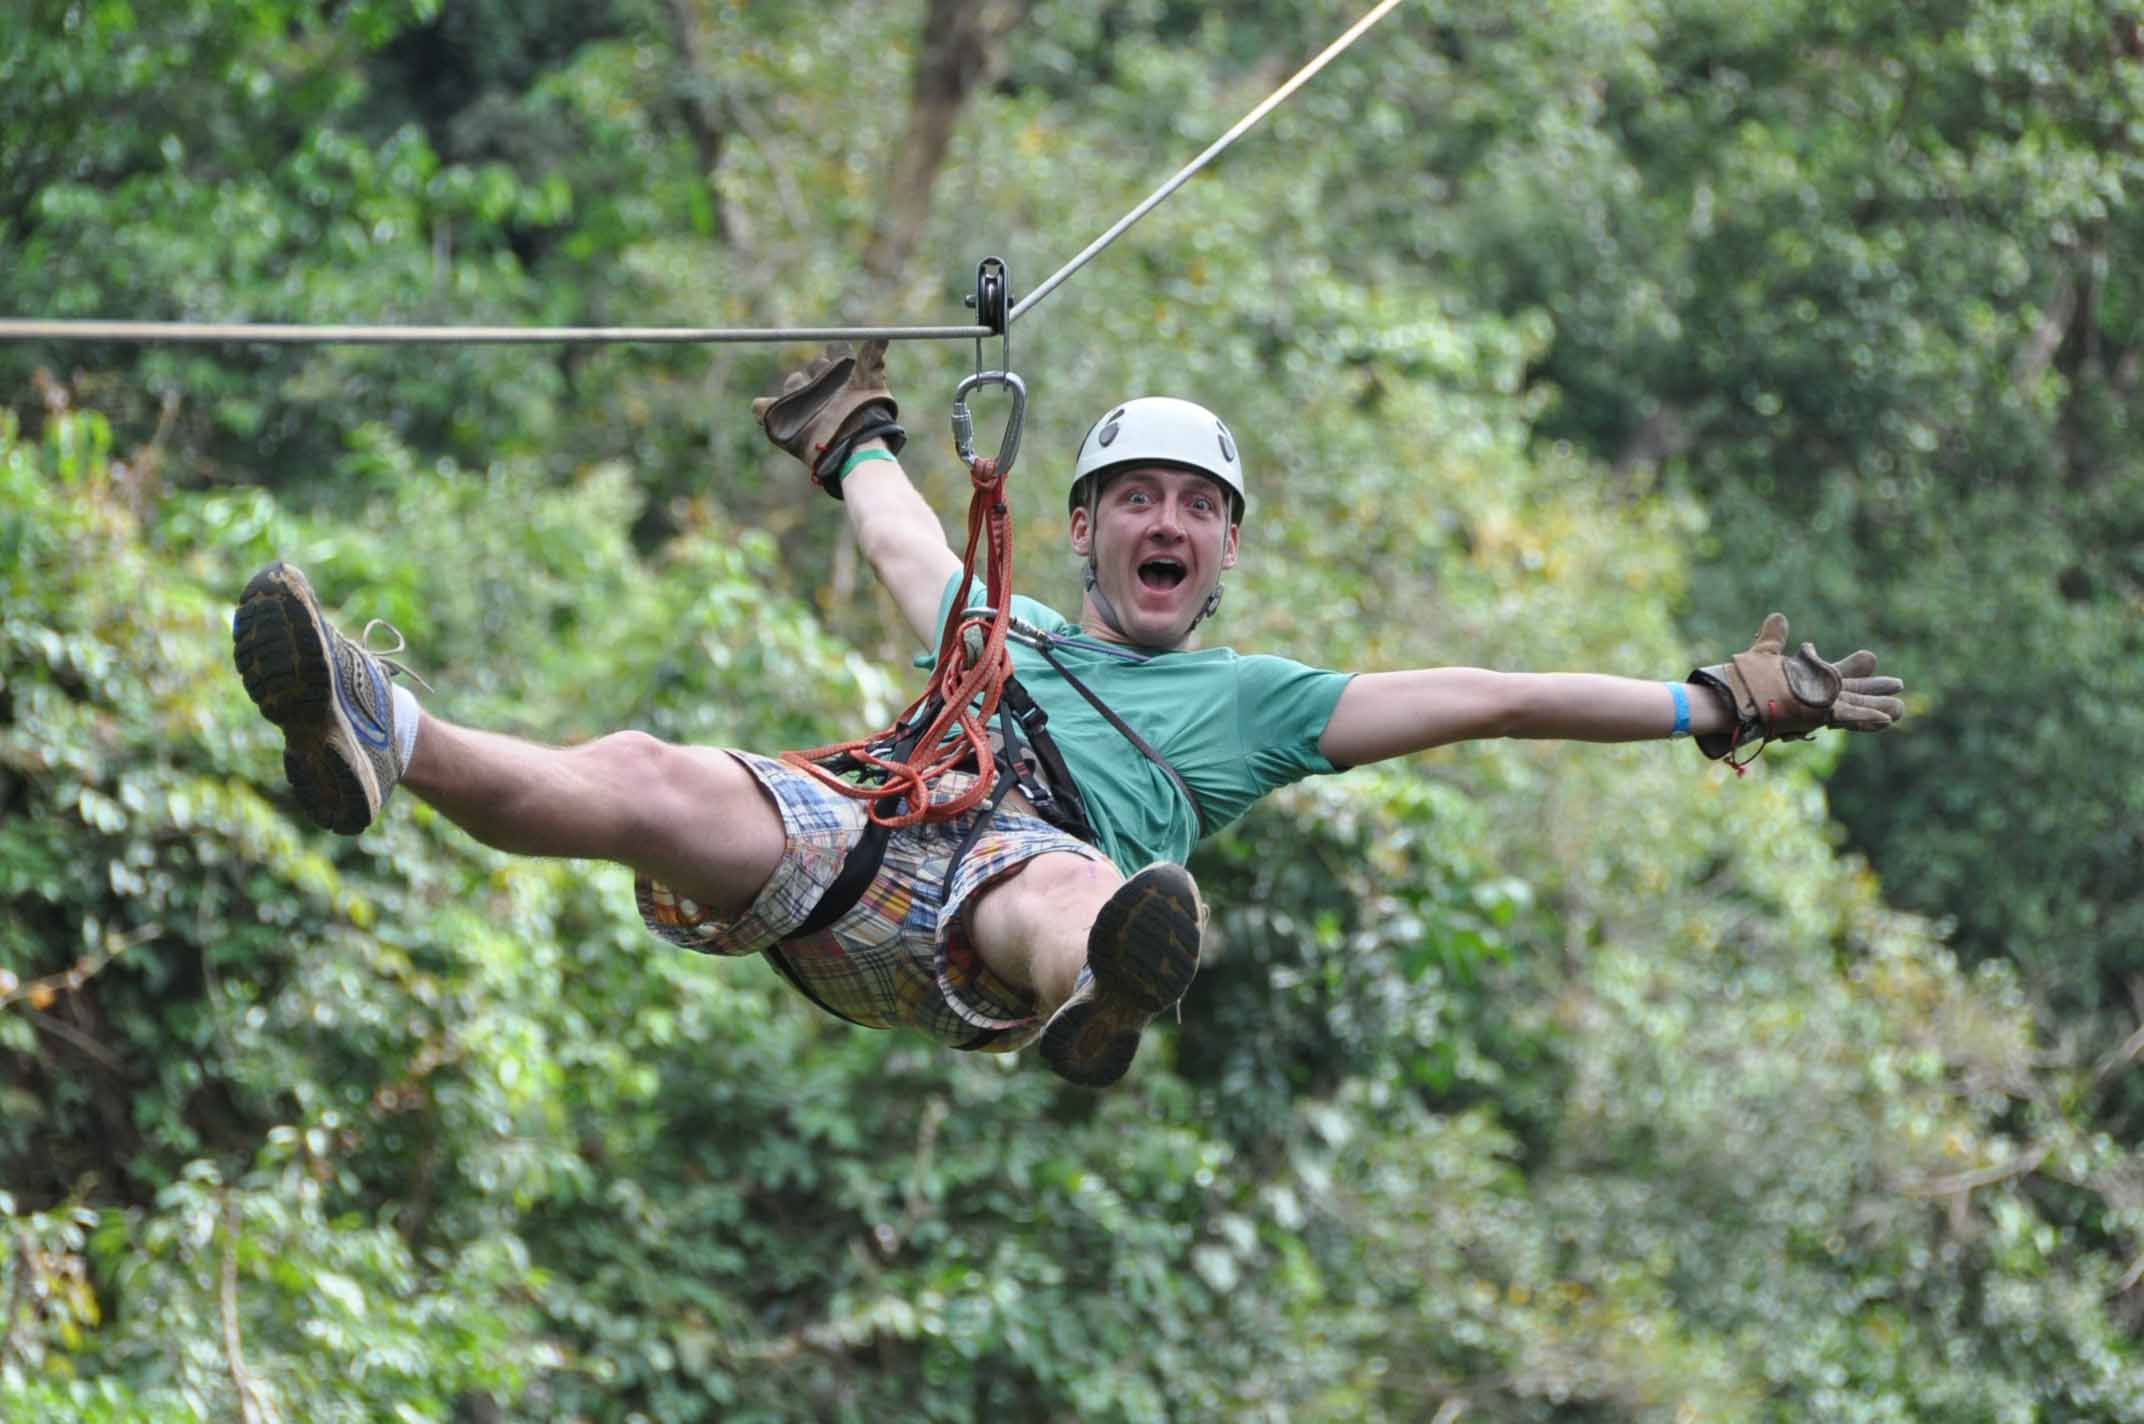 Zip Line Canopy Adventure Tour